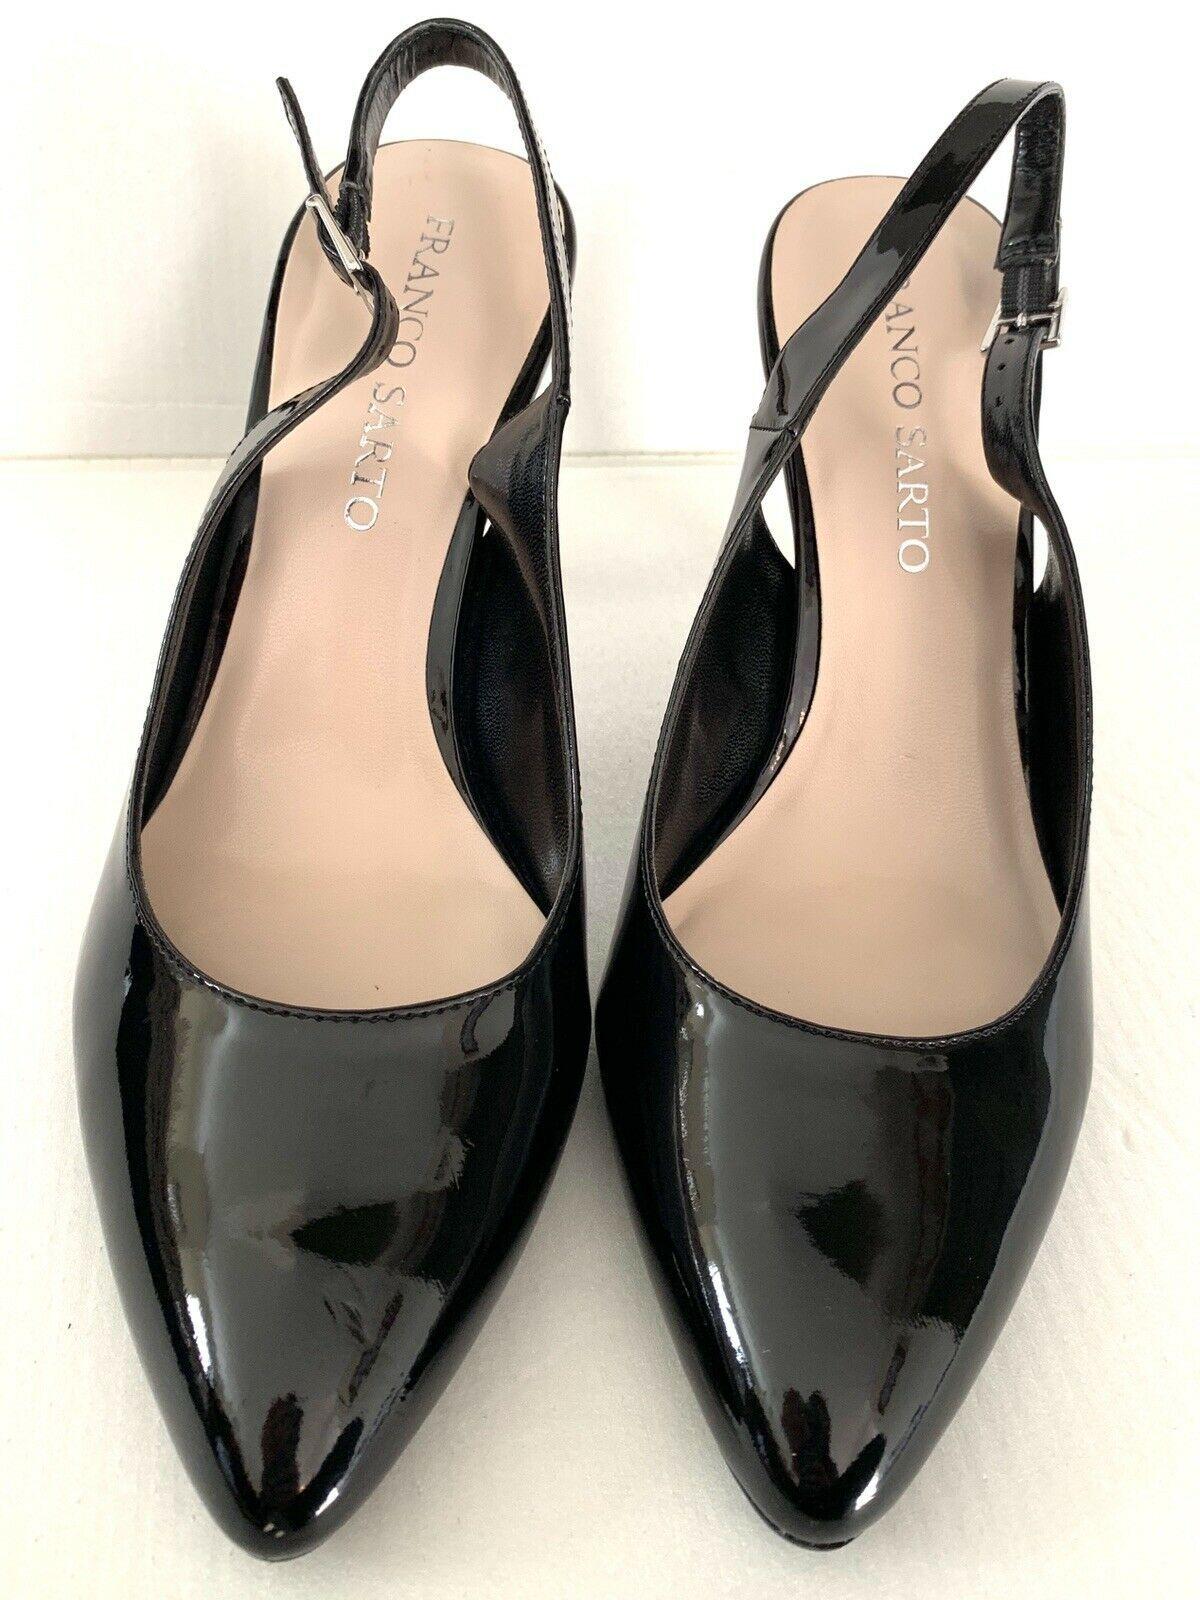 FRANCO SARTO Harla Black Patent Leather Slingback Pumps Heels SZ 8.5M image 4